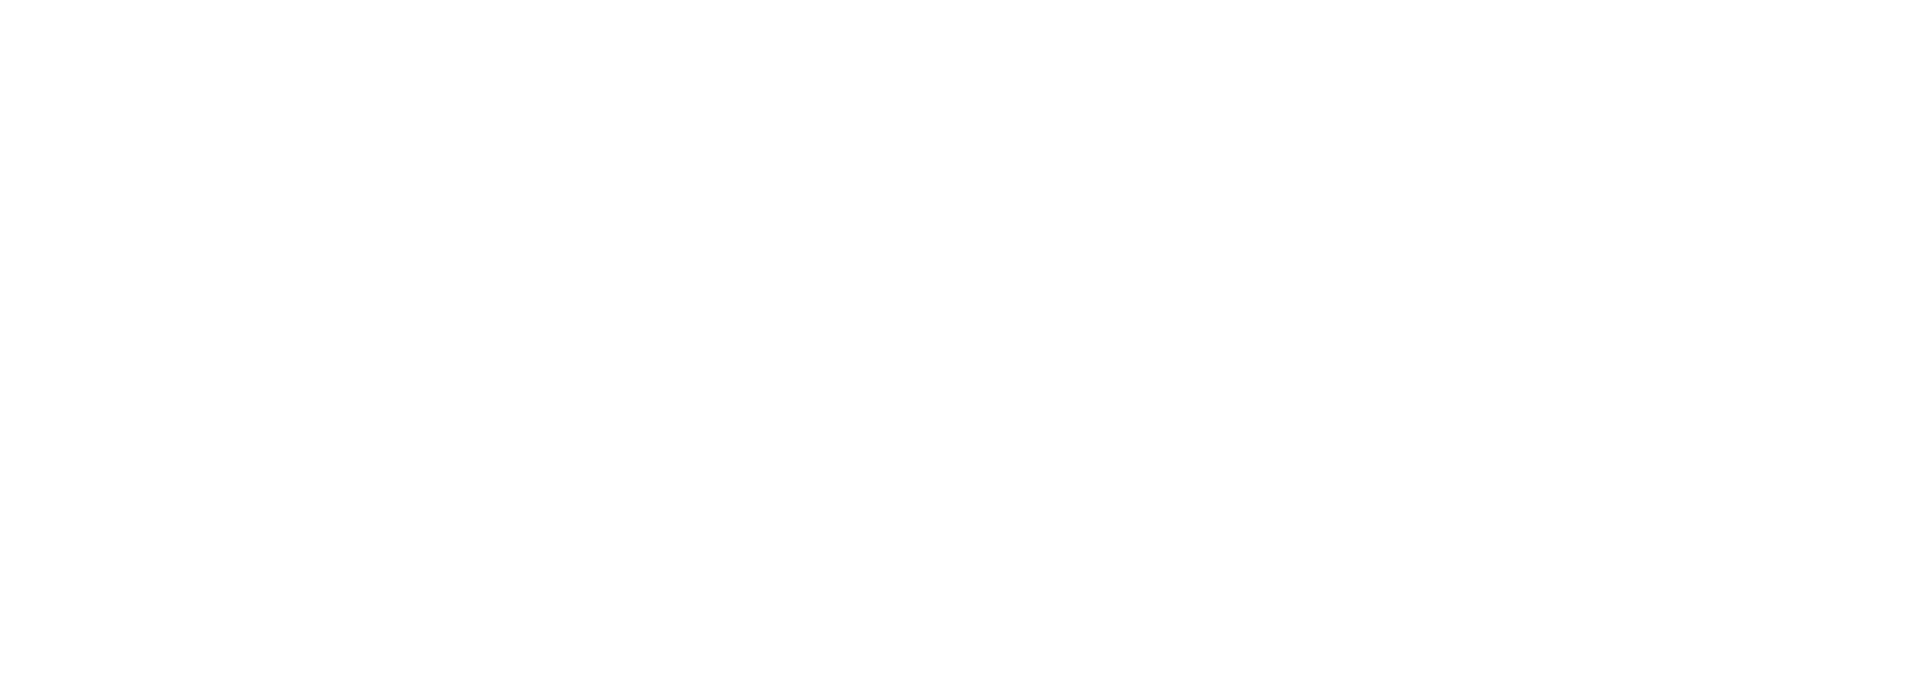 nawa-go-poland-baner-v1-4.png